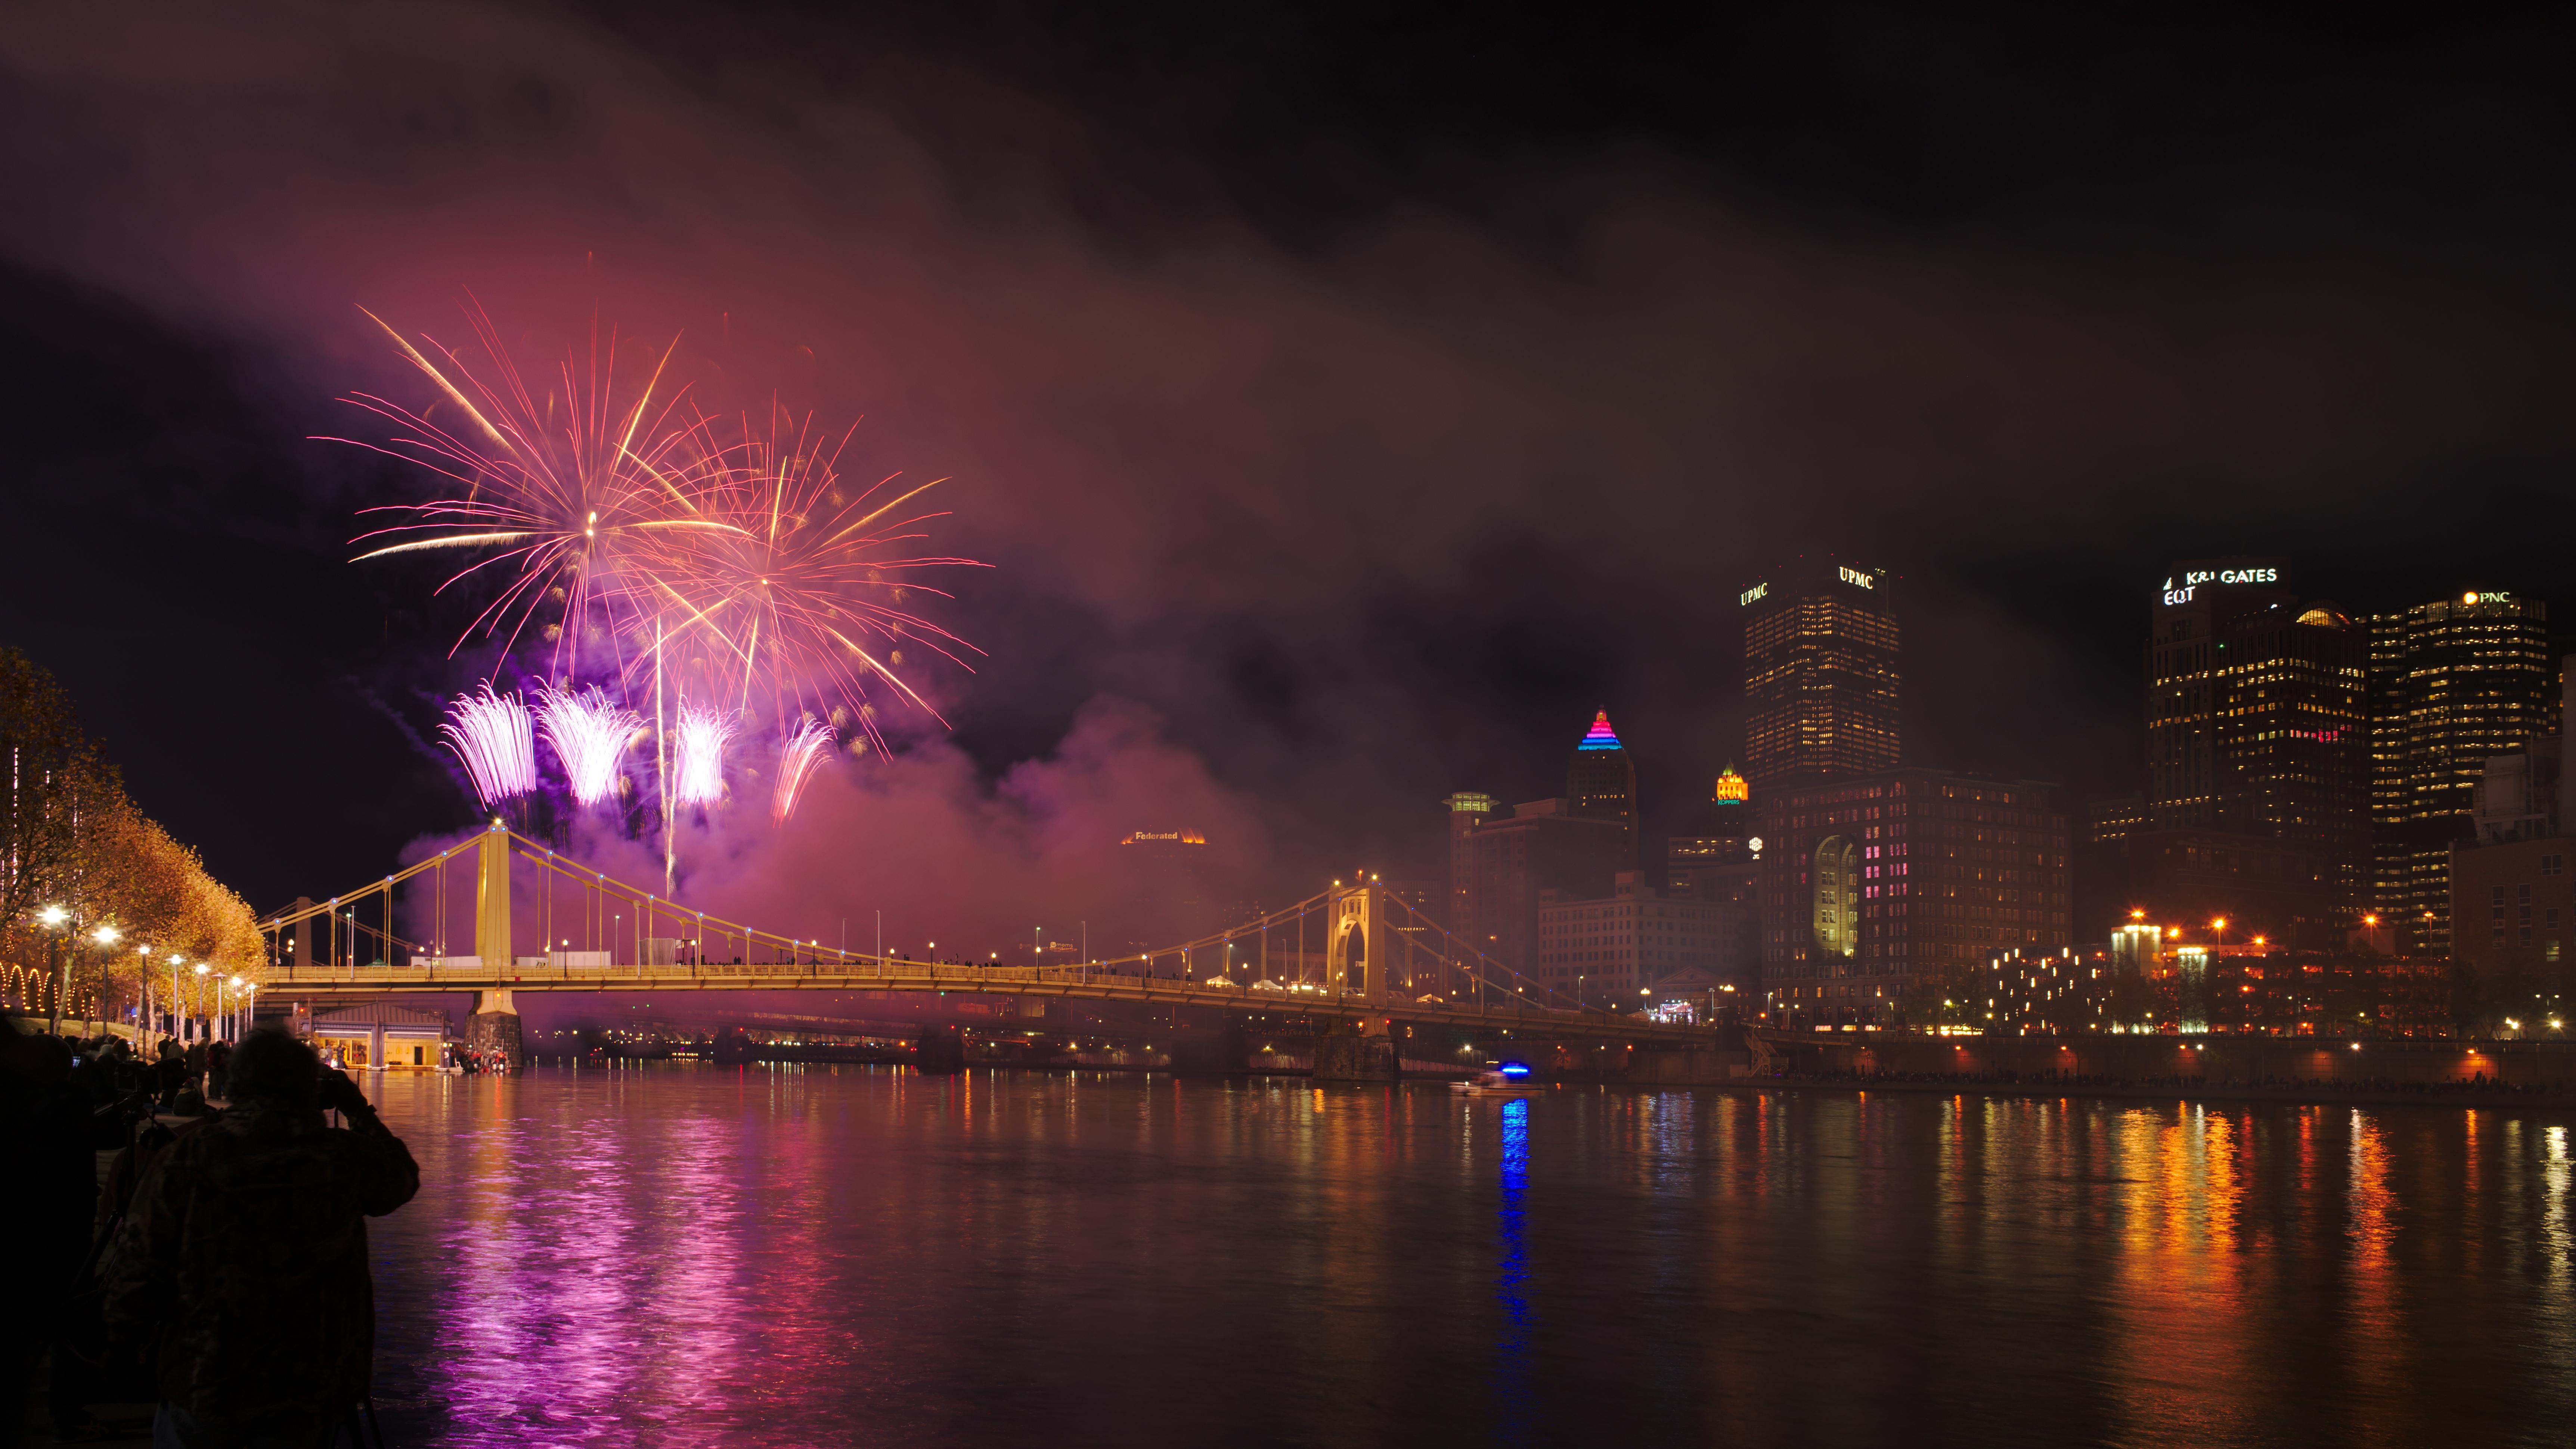 FileFireworks at the Pittsburgh Light Up Night 2015.jpg & File:Fireworks at the Pittsburgh Light Up Night 2015.jpg - Wikimedia ...